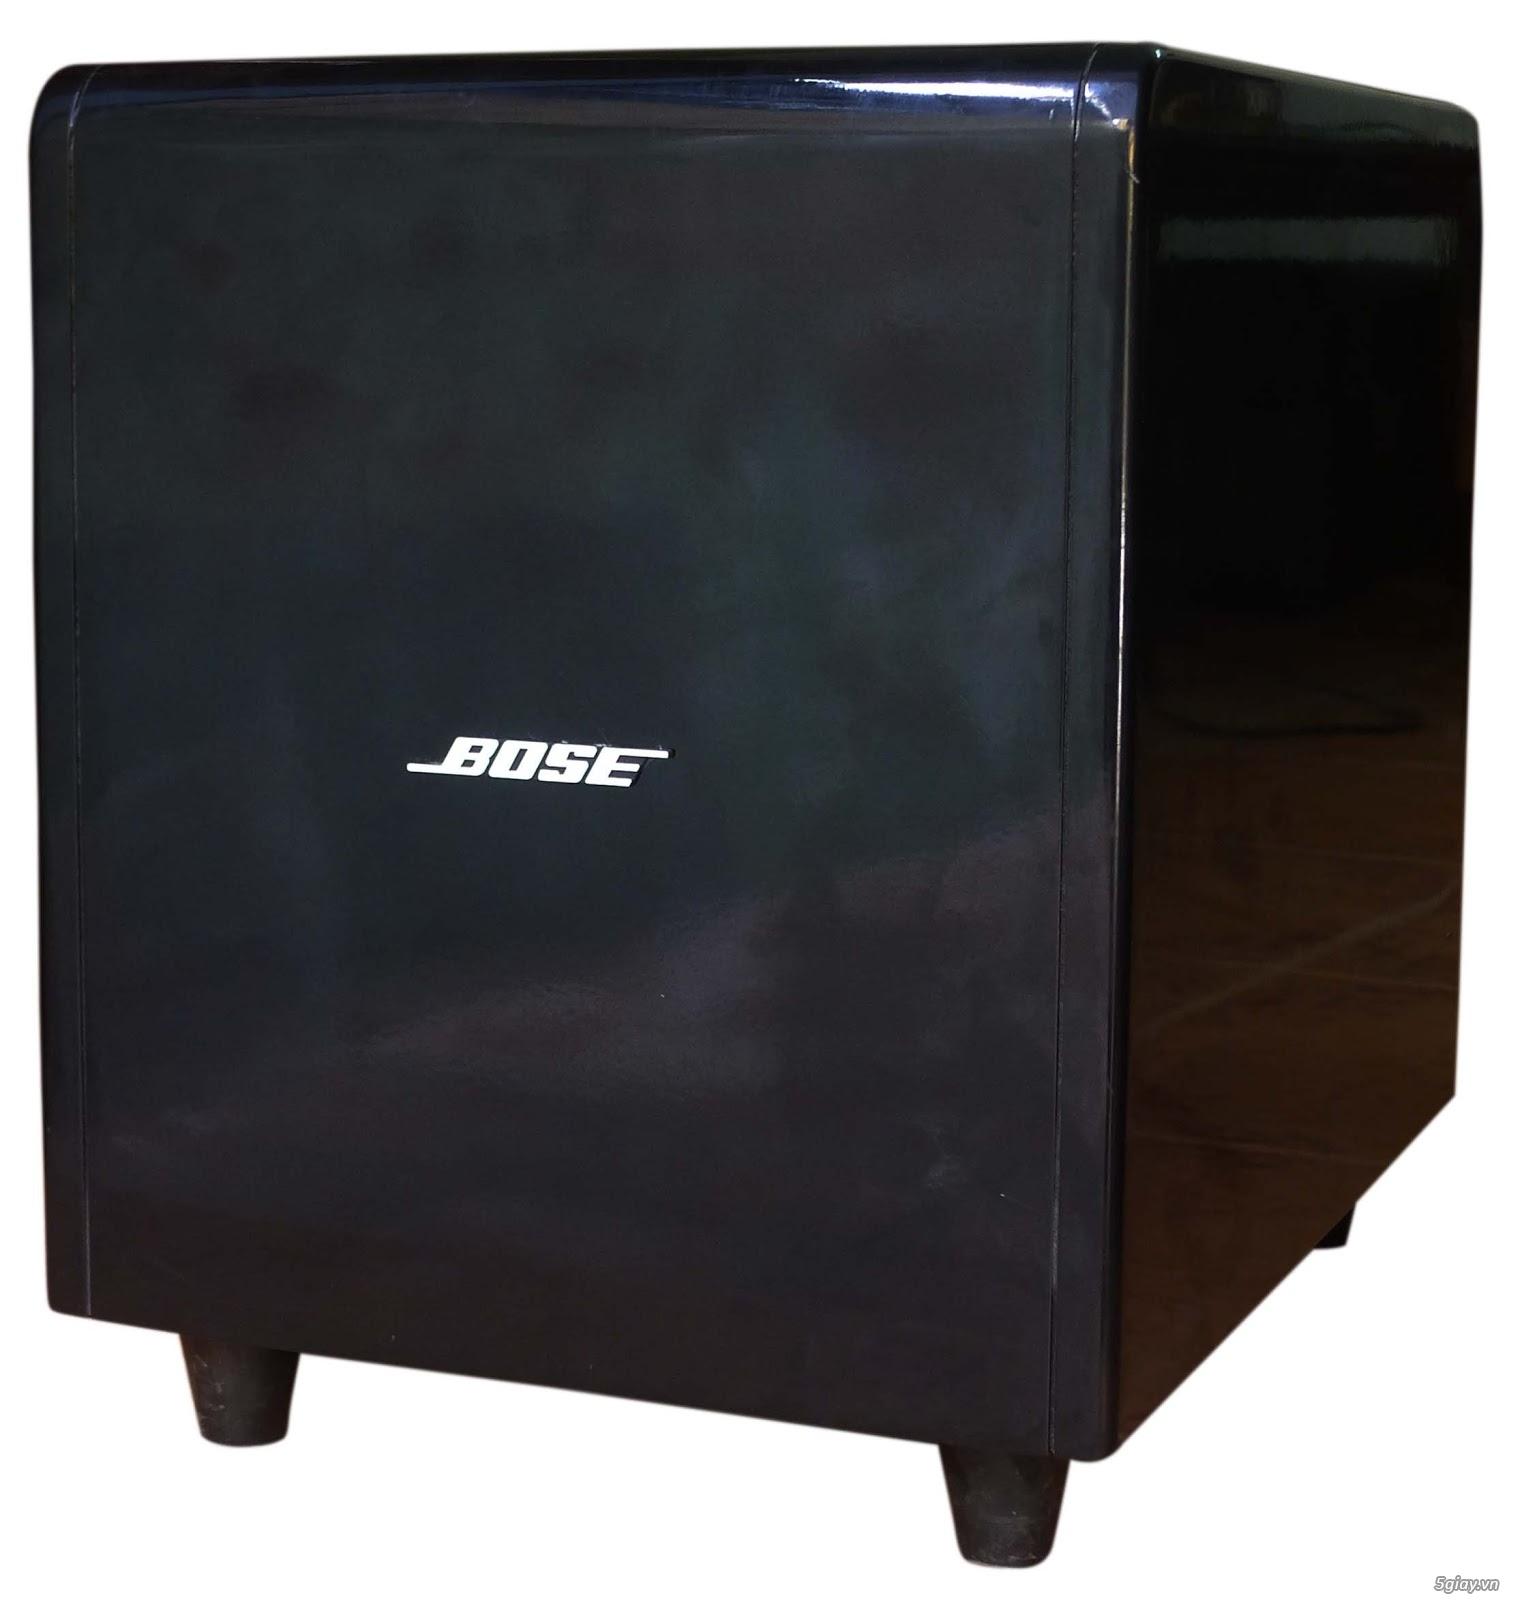 Loa Subwoofer Bose S – 1200 siêu trầm cho bộ dàn karaoke